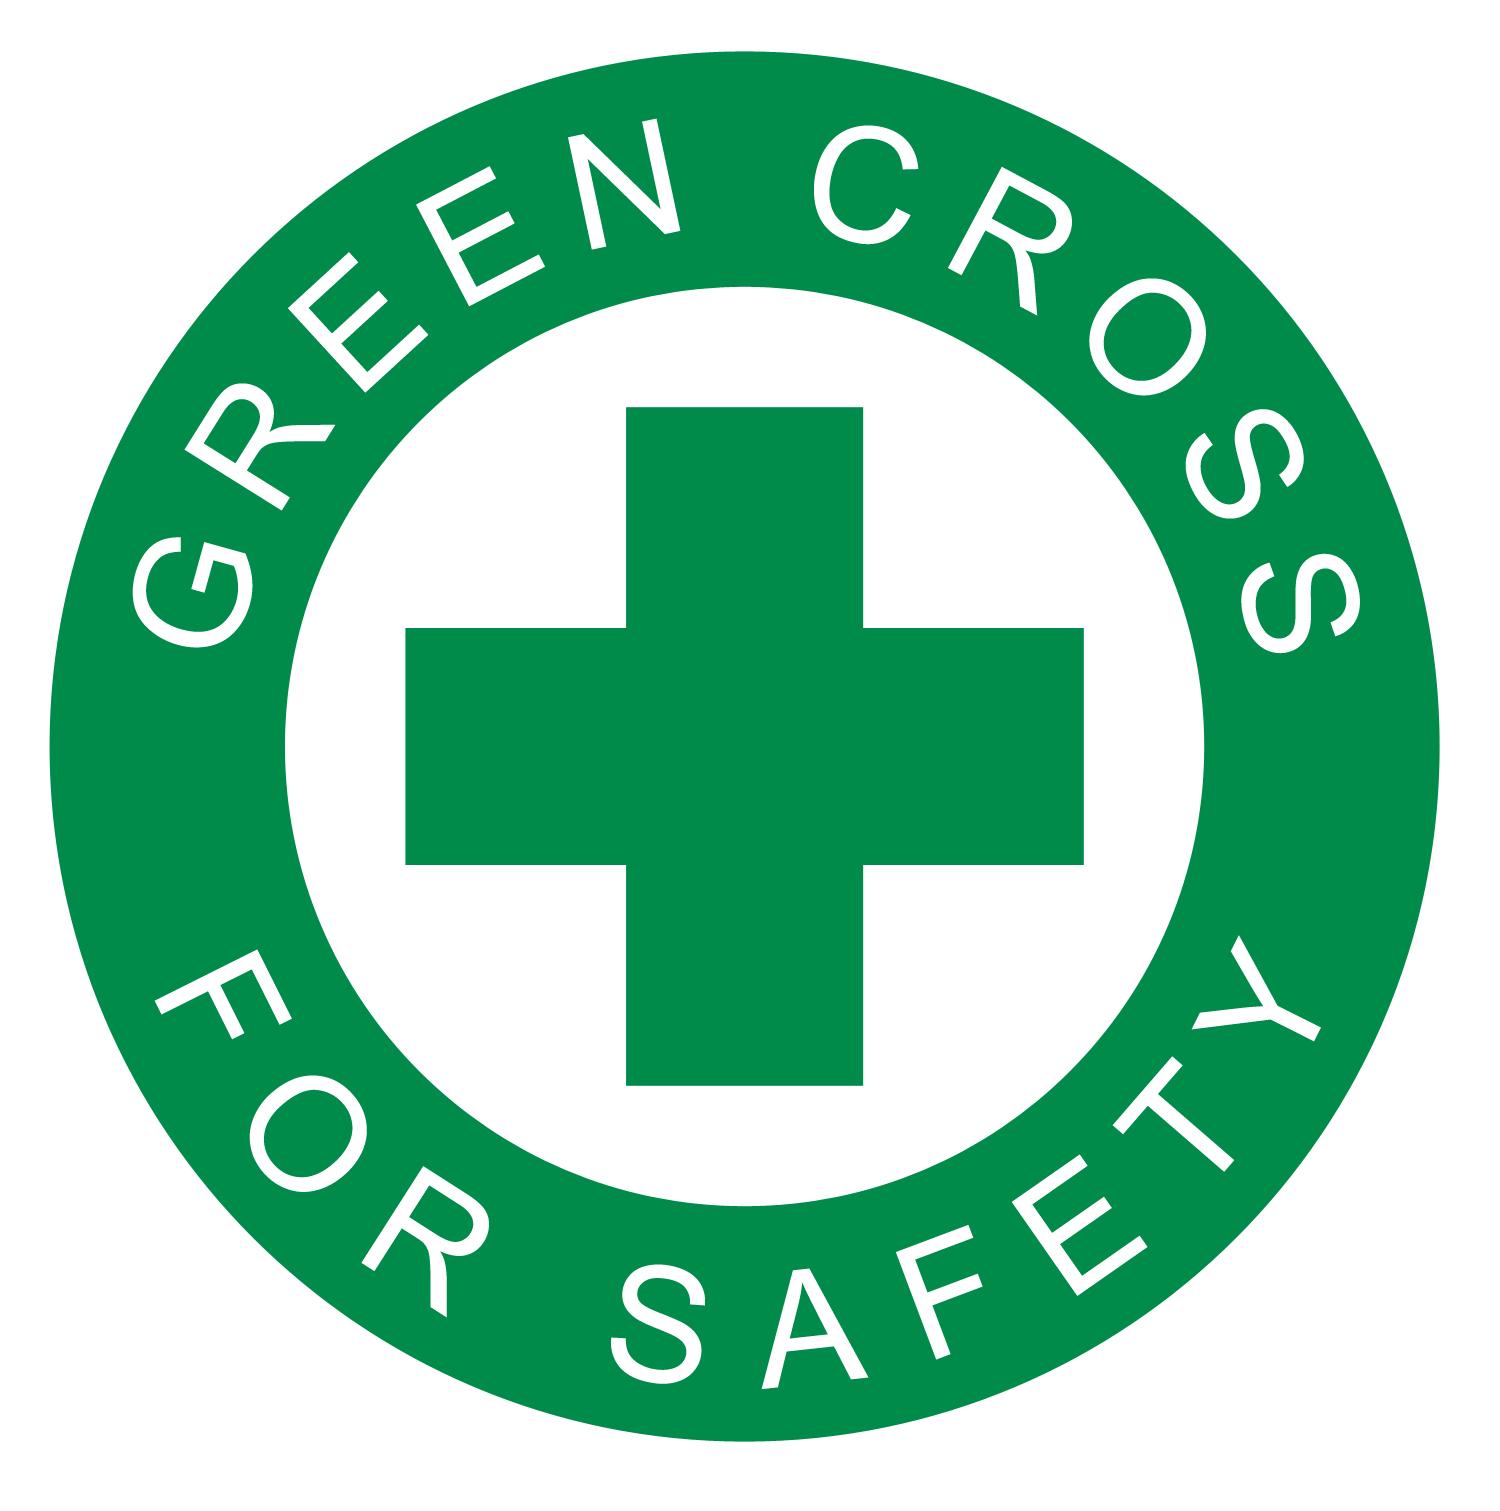 Logo - Green Cross For Safety